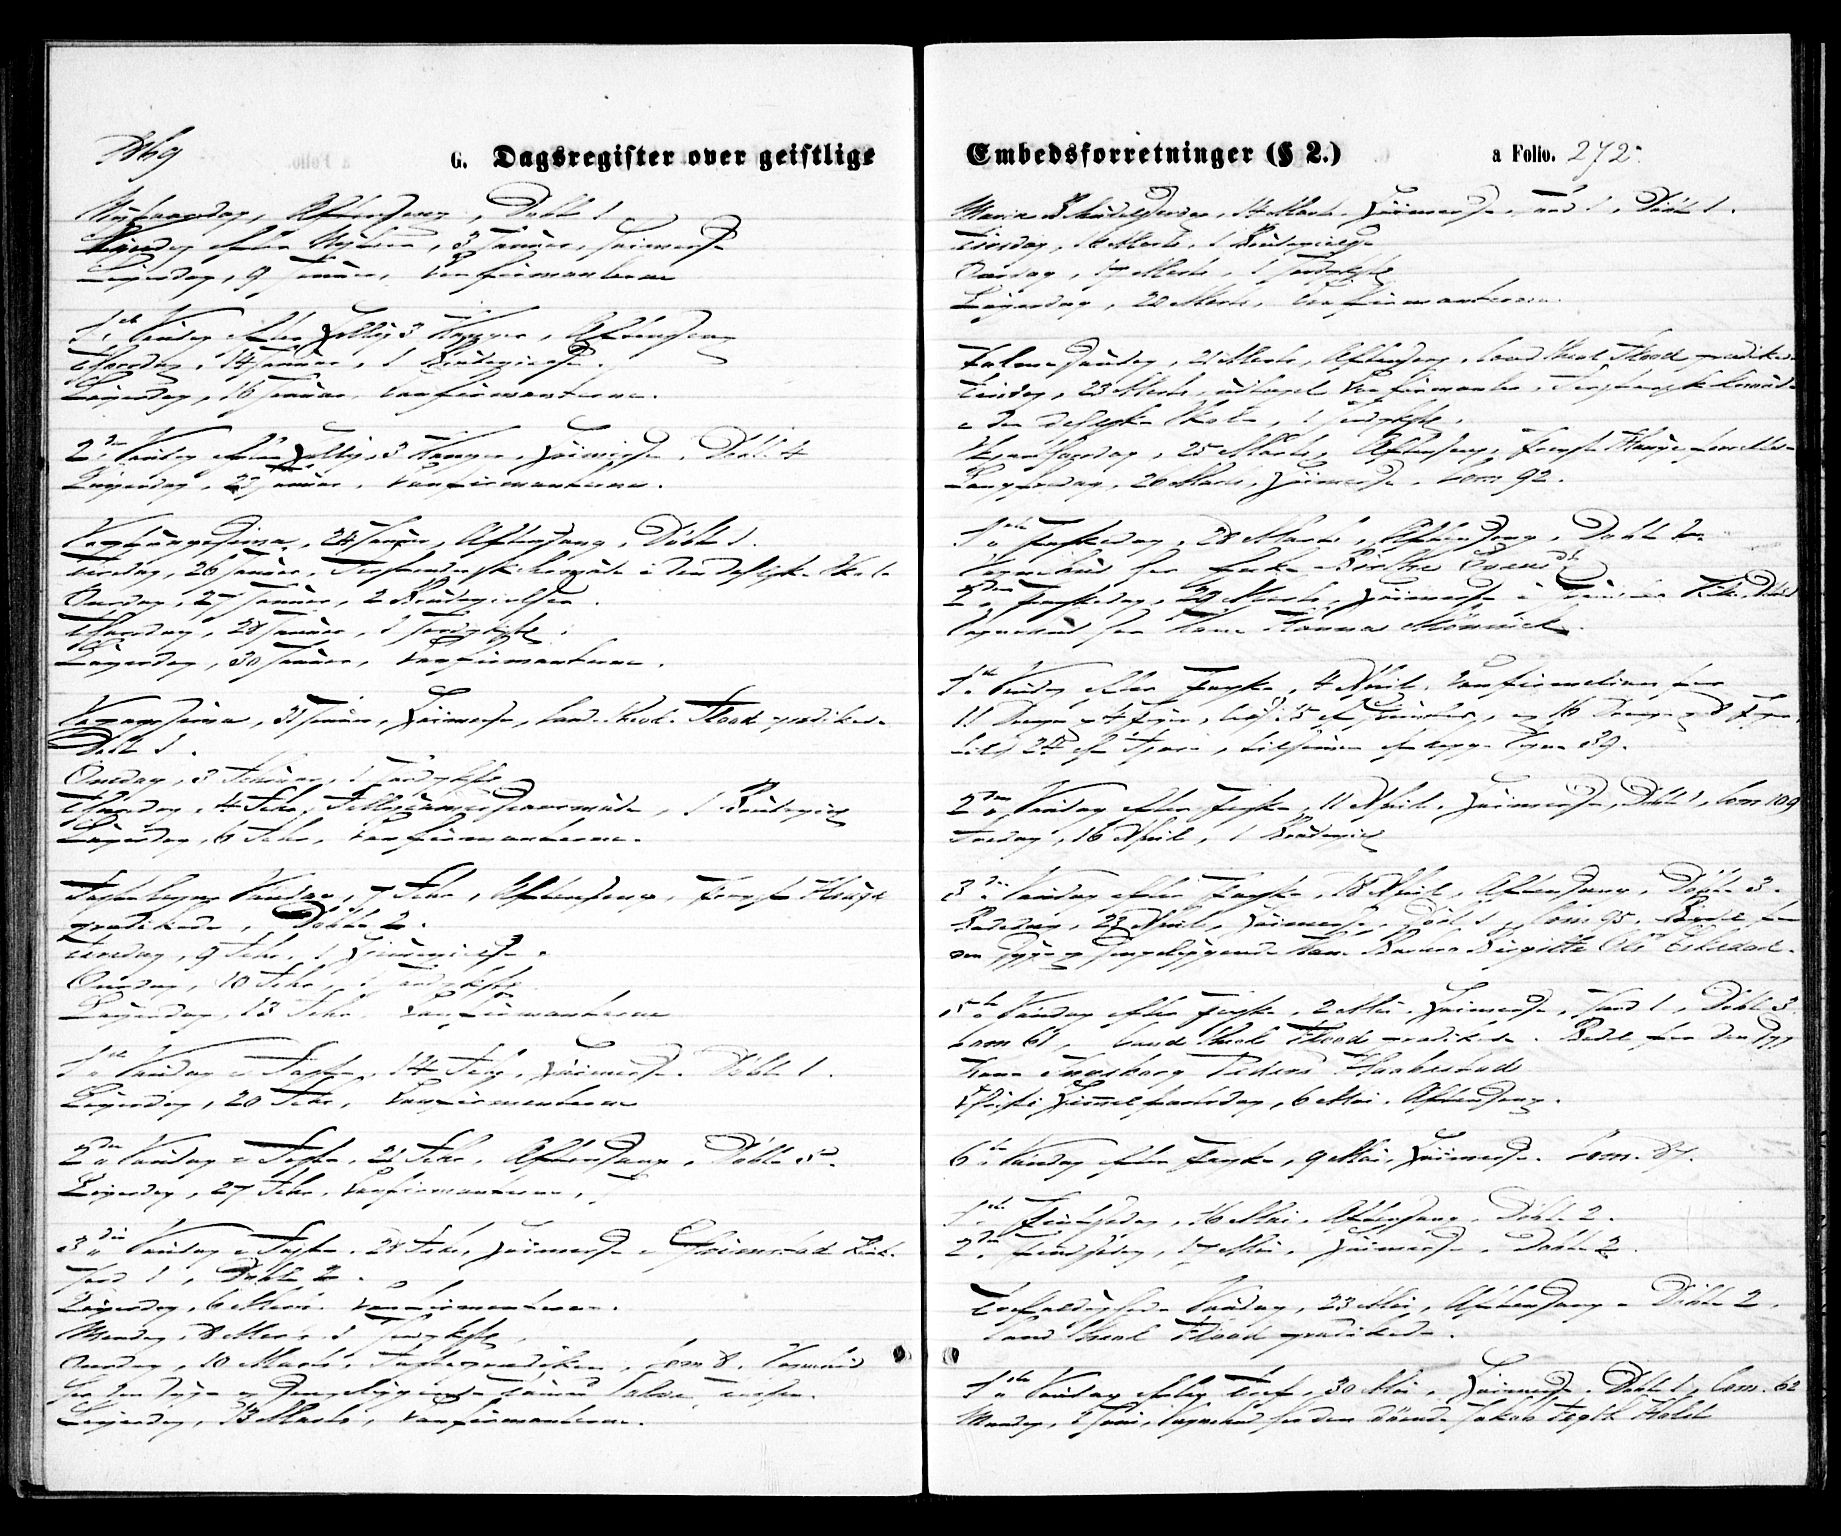 SAK, Grimstad sokneprestkontor, F/Fa/L0002: Ministerialbok nr. A 1, 1869-1881, s. 272